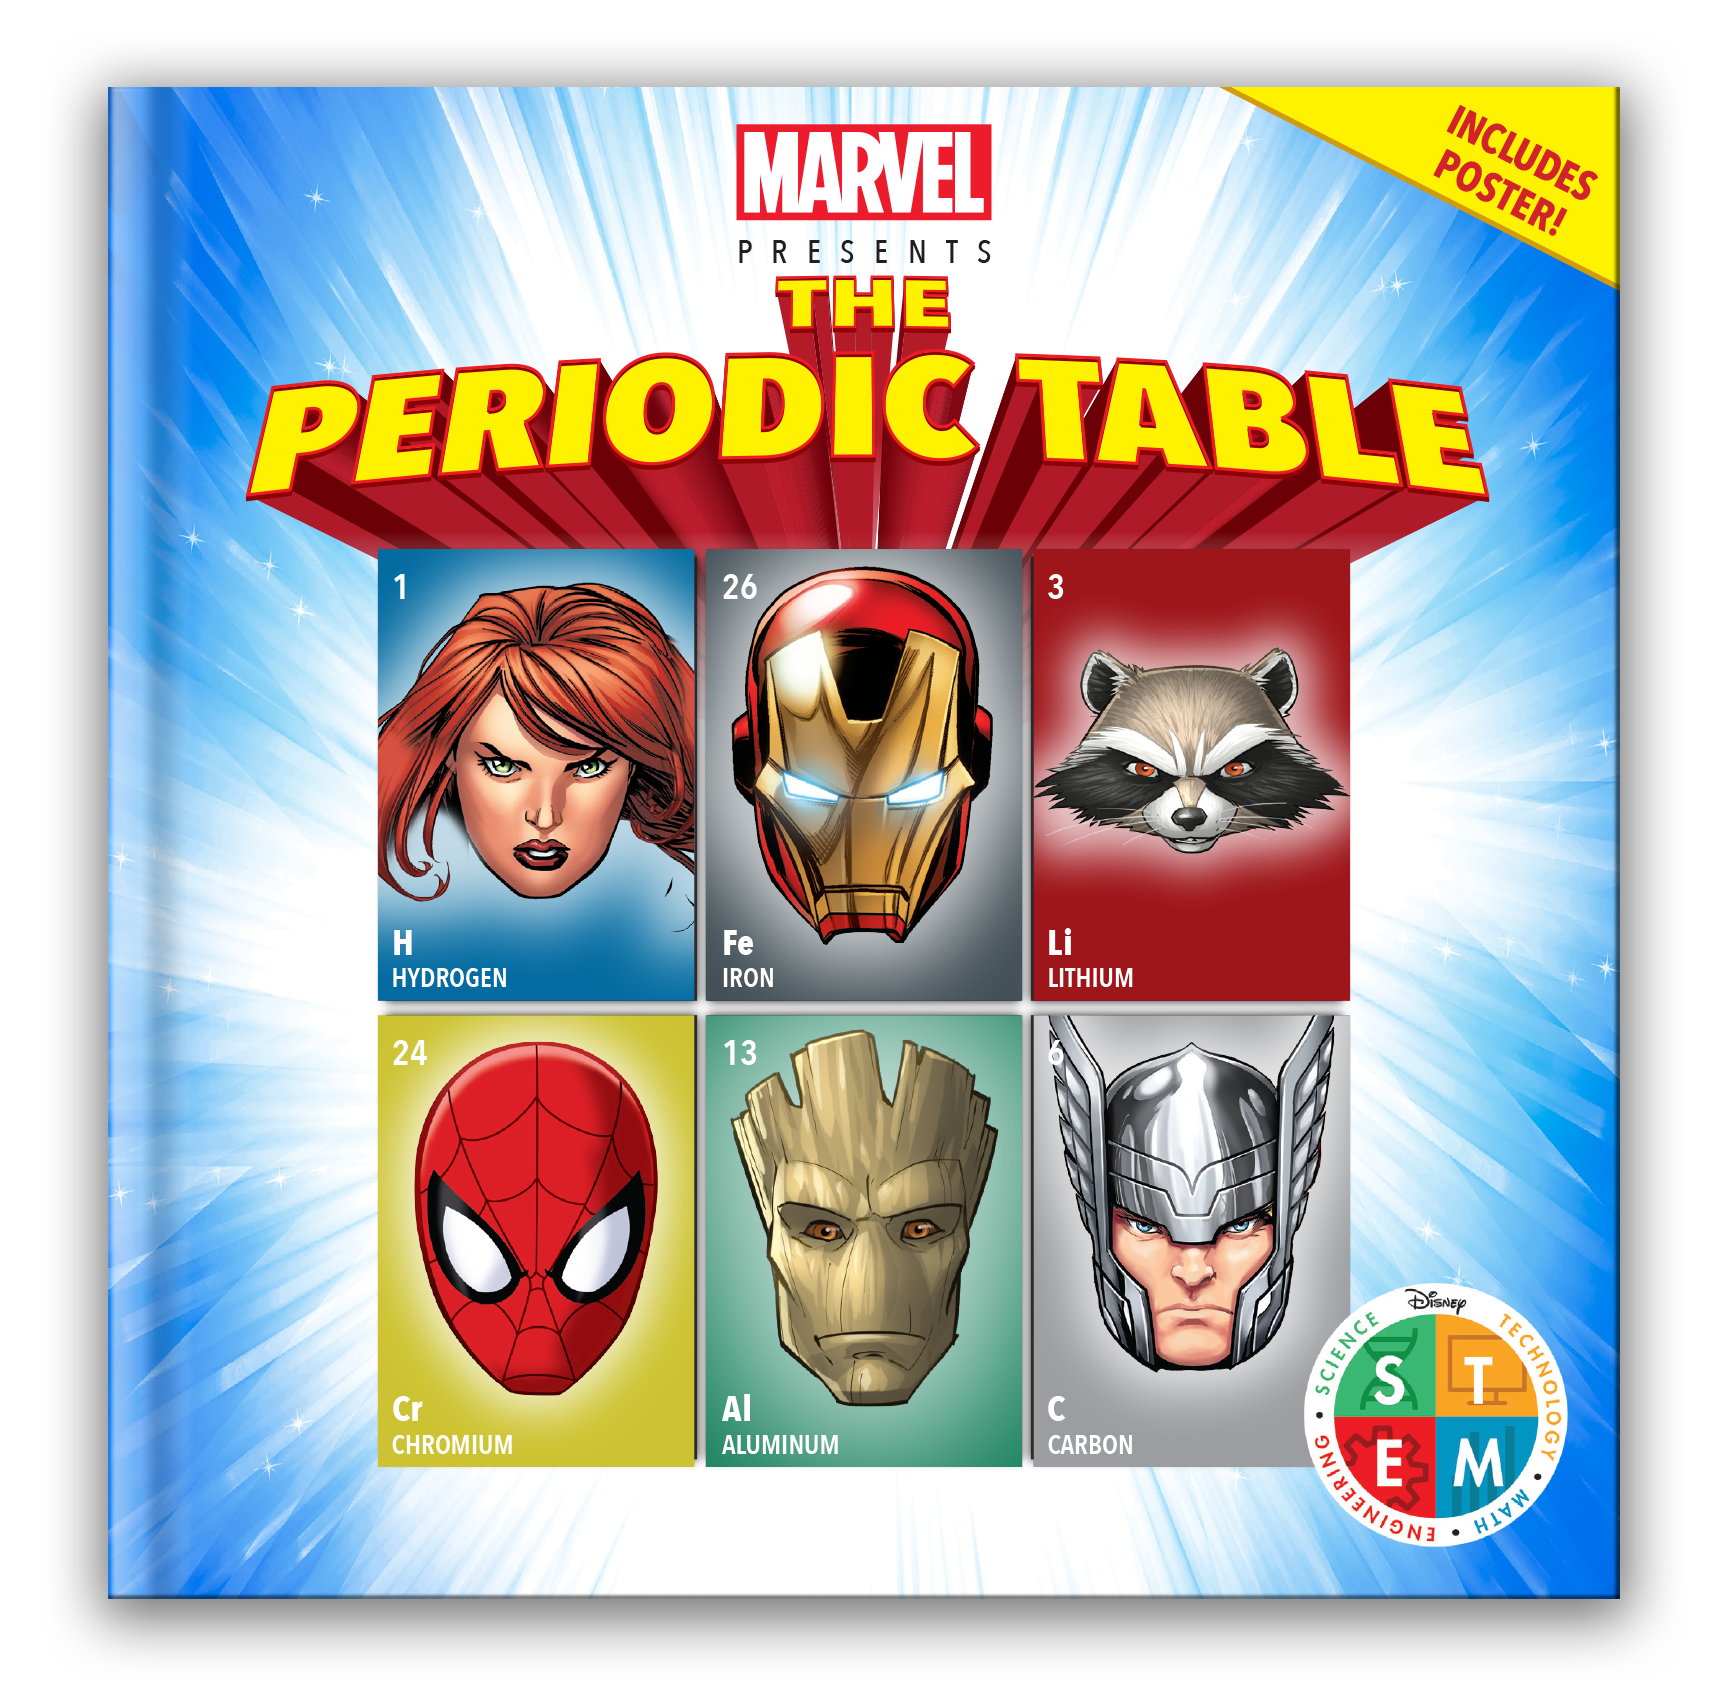 Marvel-Peridoc-Table-Displayer.png